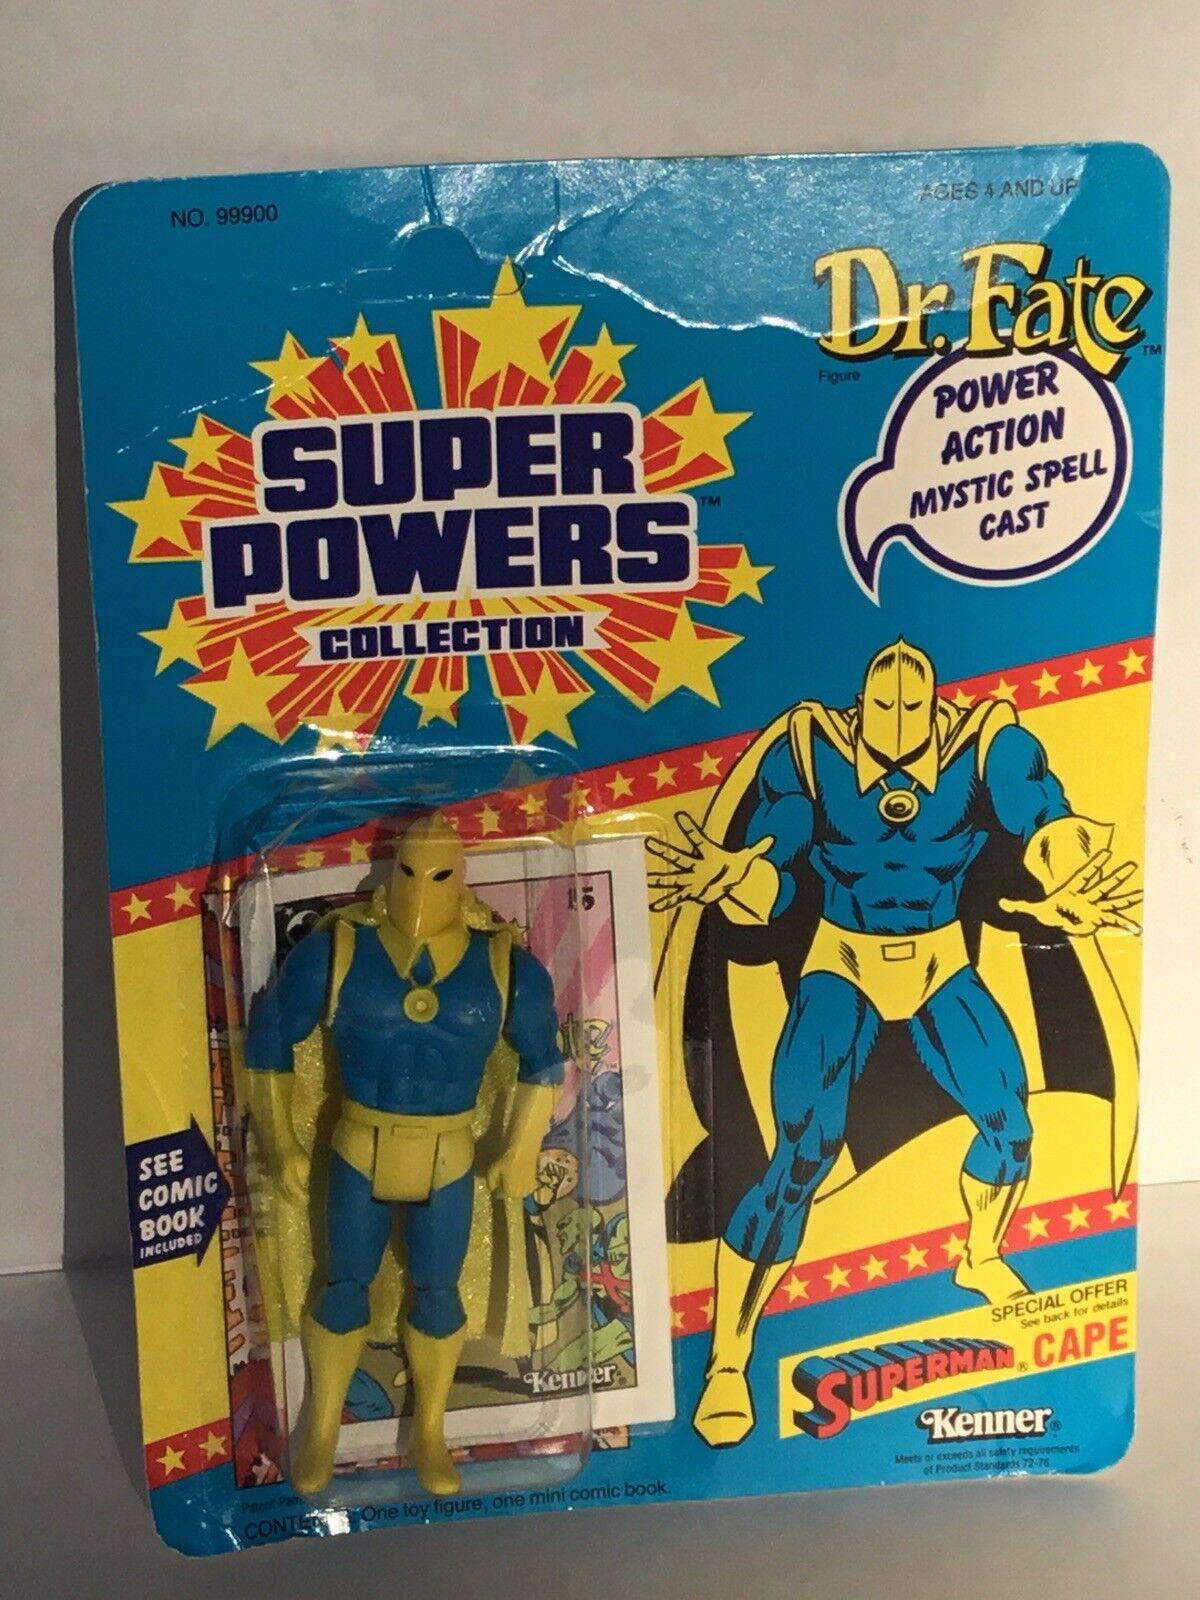 Kenner Super Powers  DR FATE  action figure  1985  DC Comics